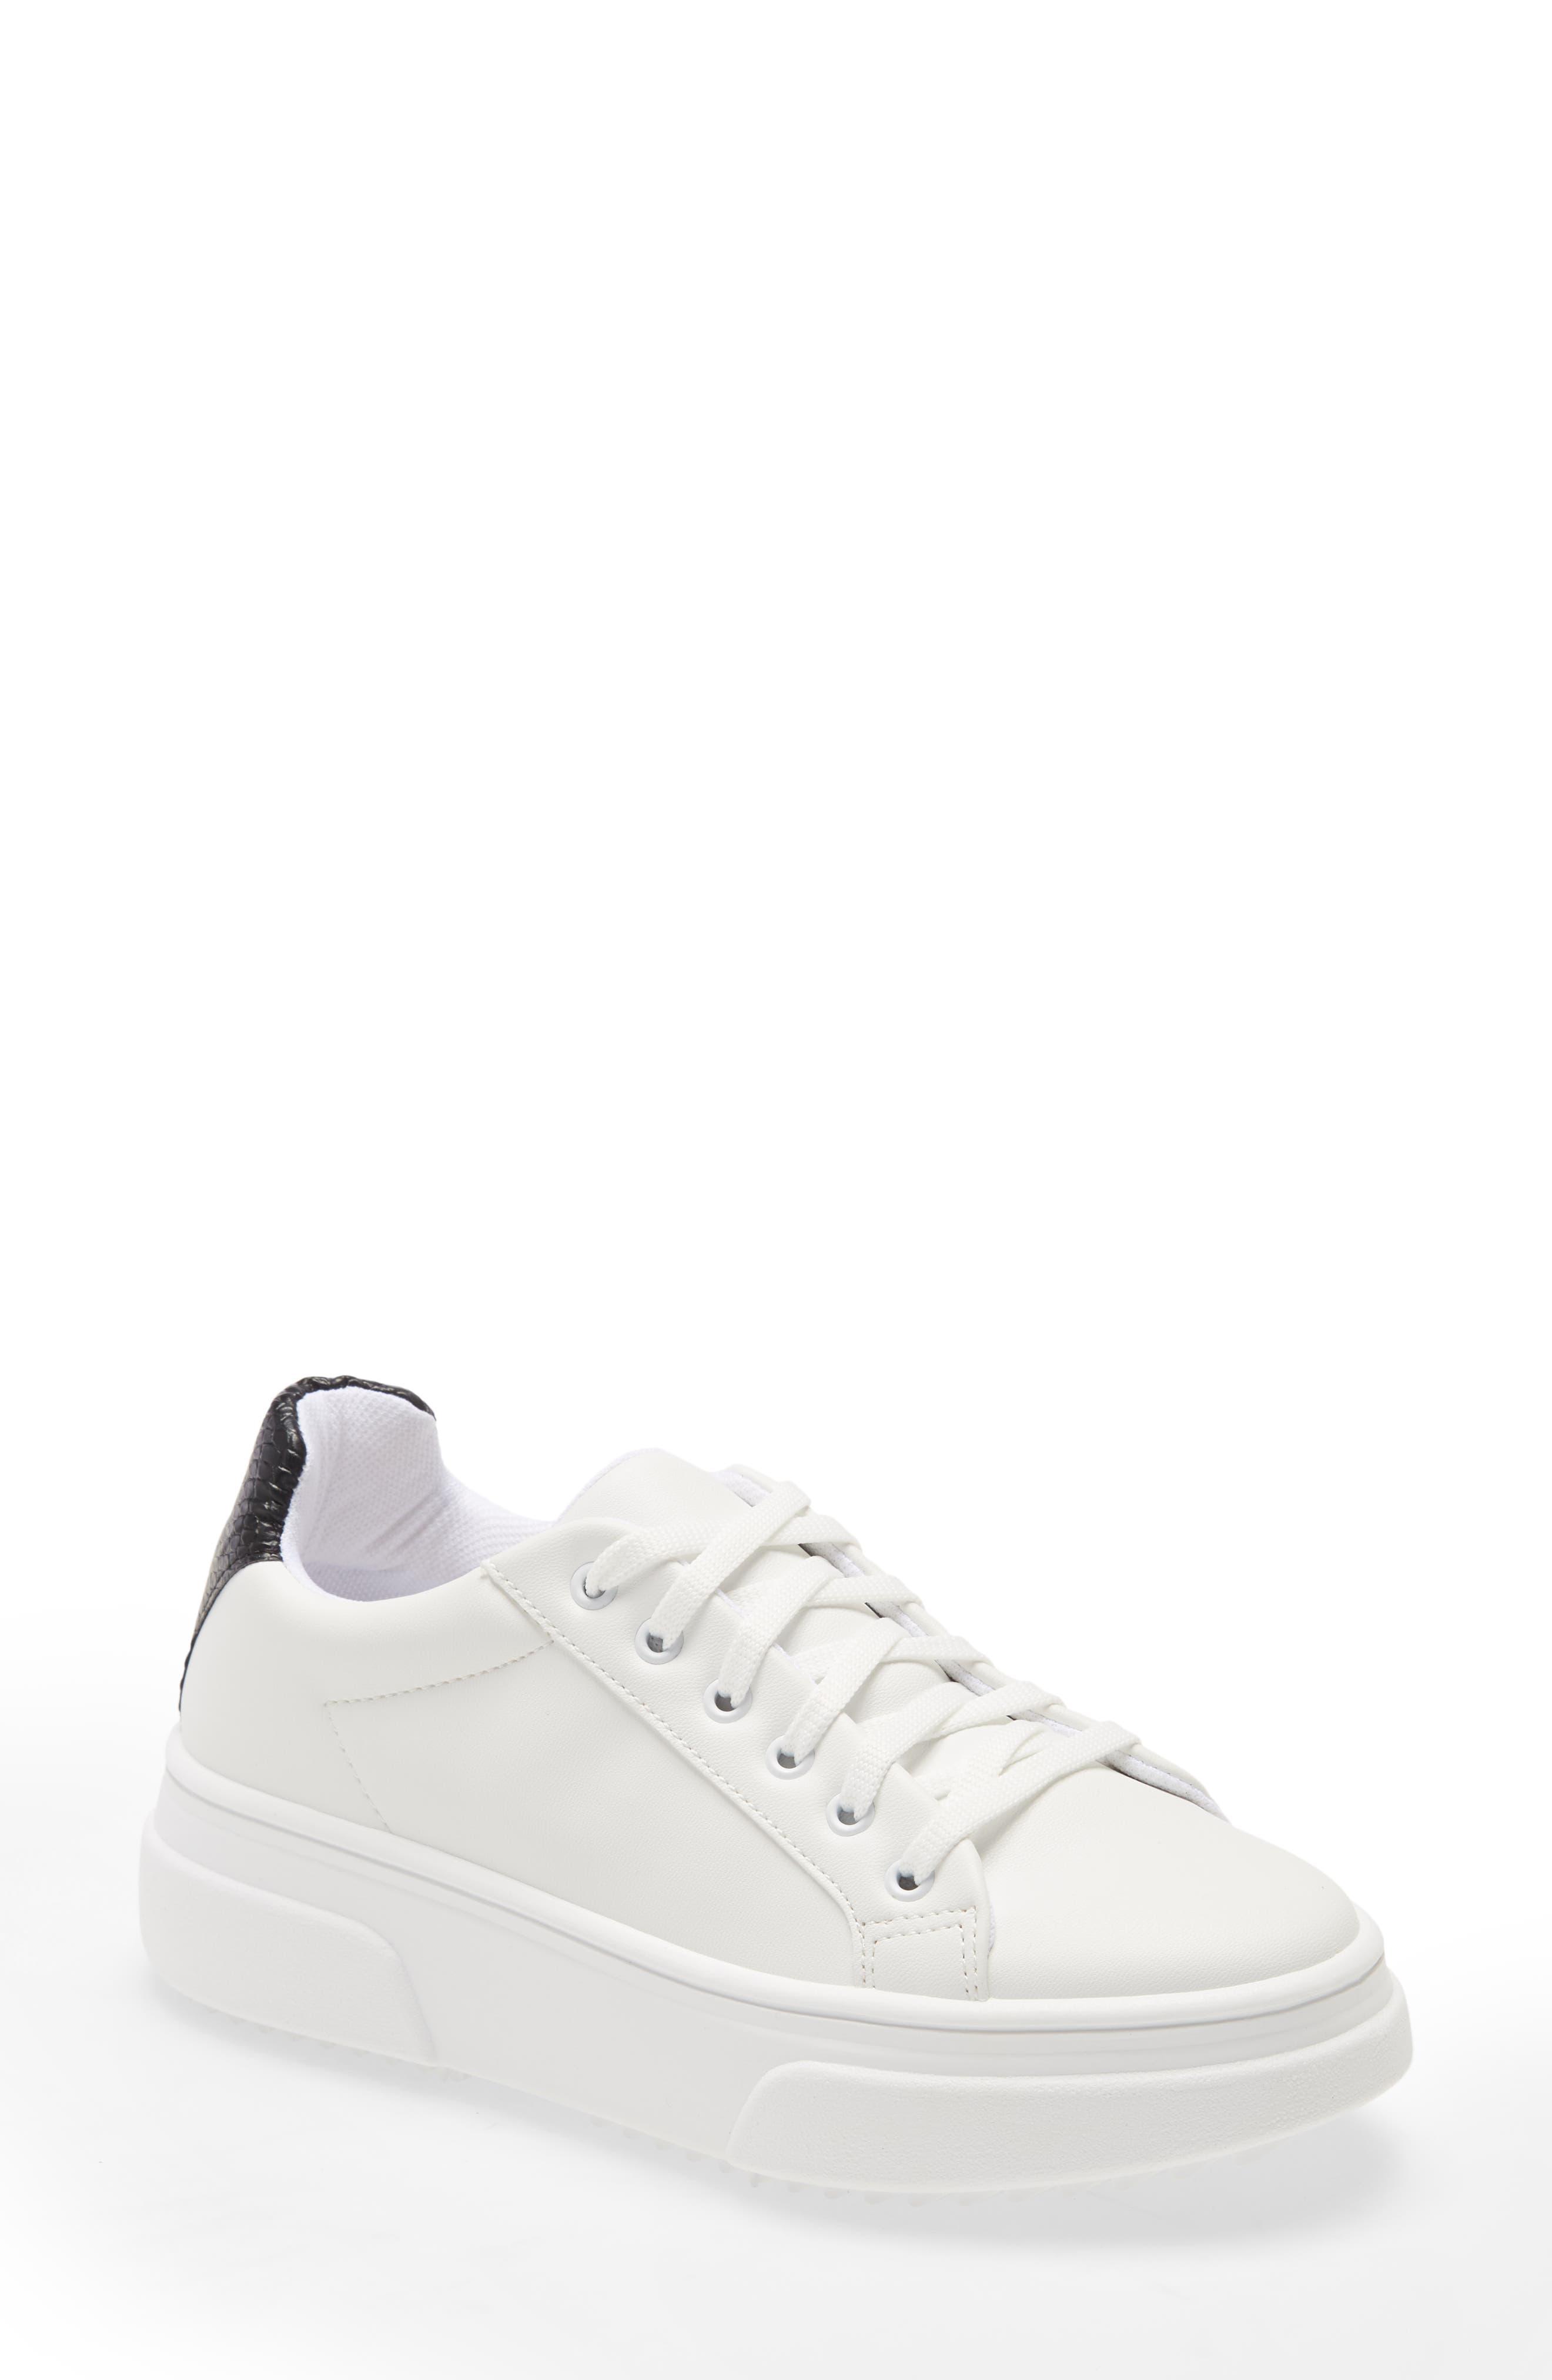 Women's Topshop Shoes Sale \u0026 Clearance